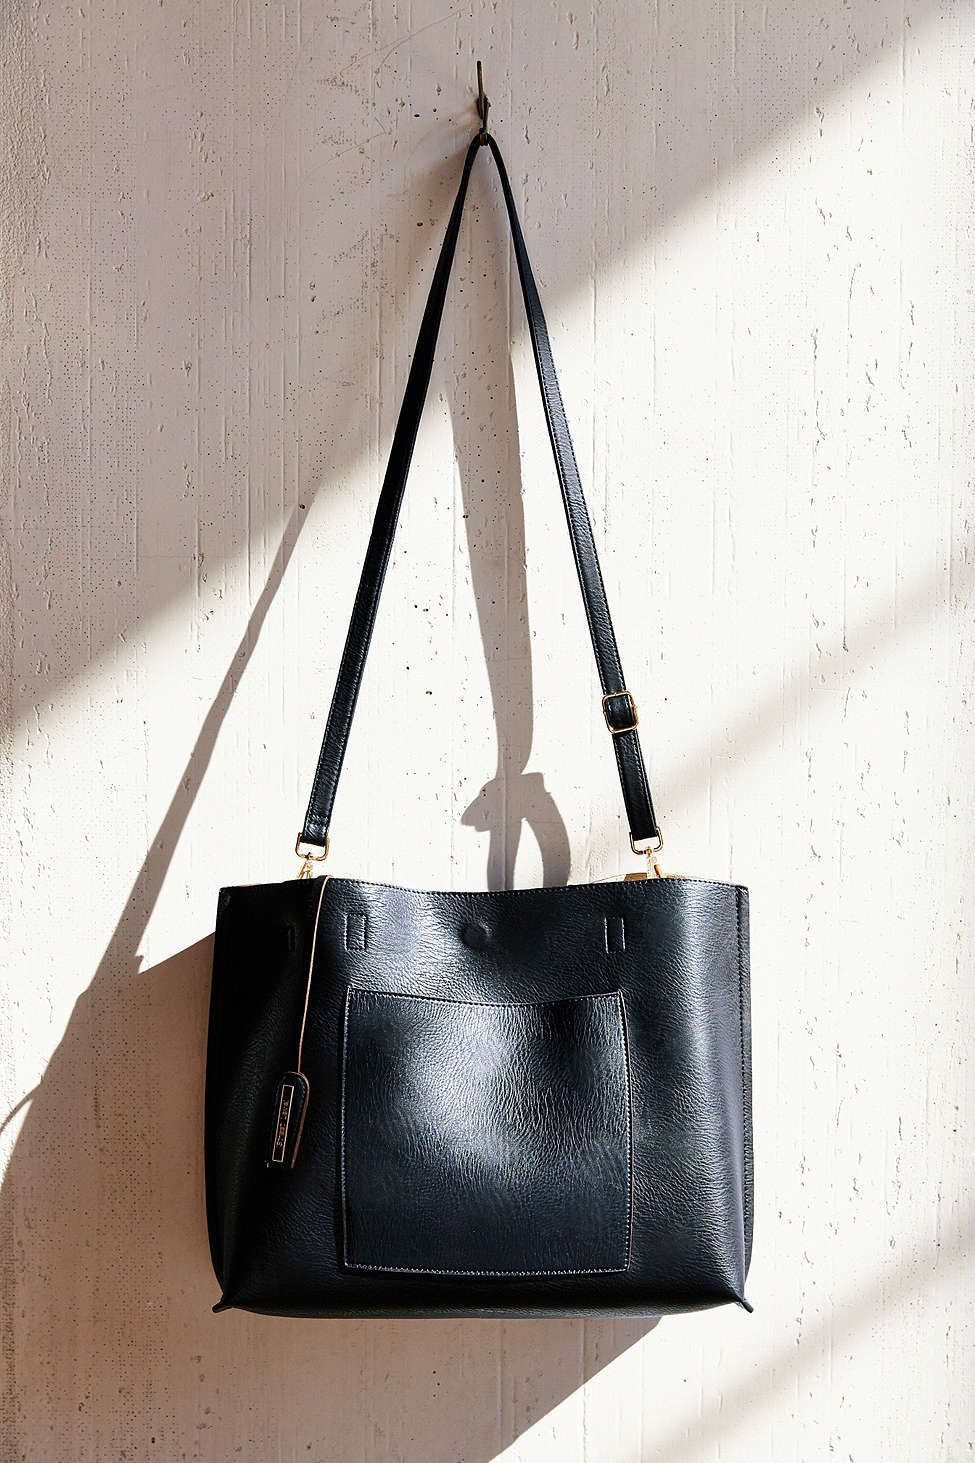 61ead85fb7e30 Reversible Faux Leather Tote Bag | Bags | Bags, Fashion bags ...